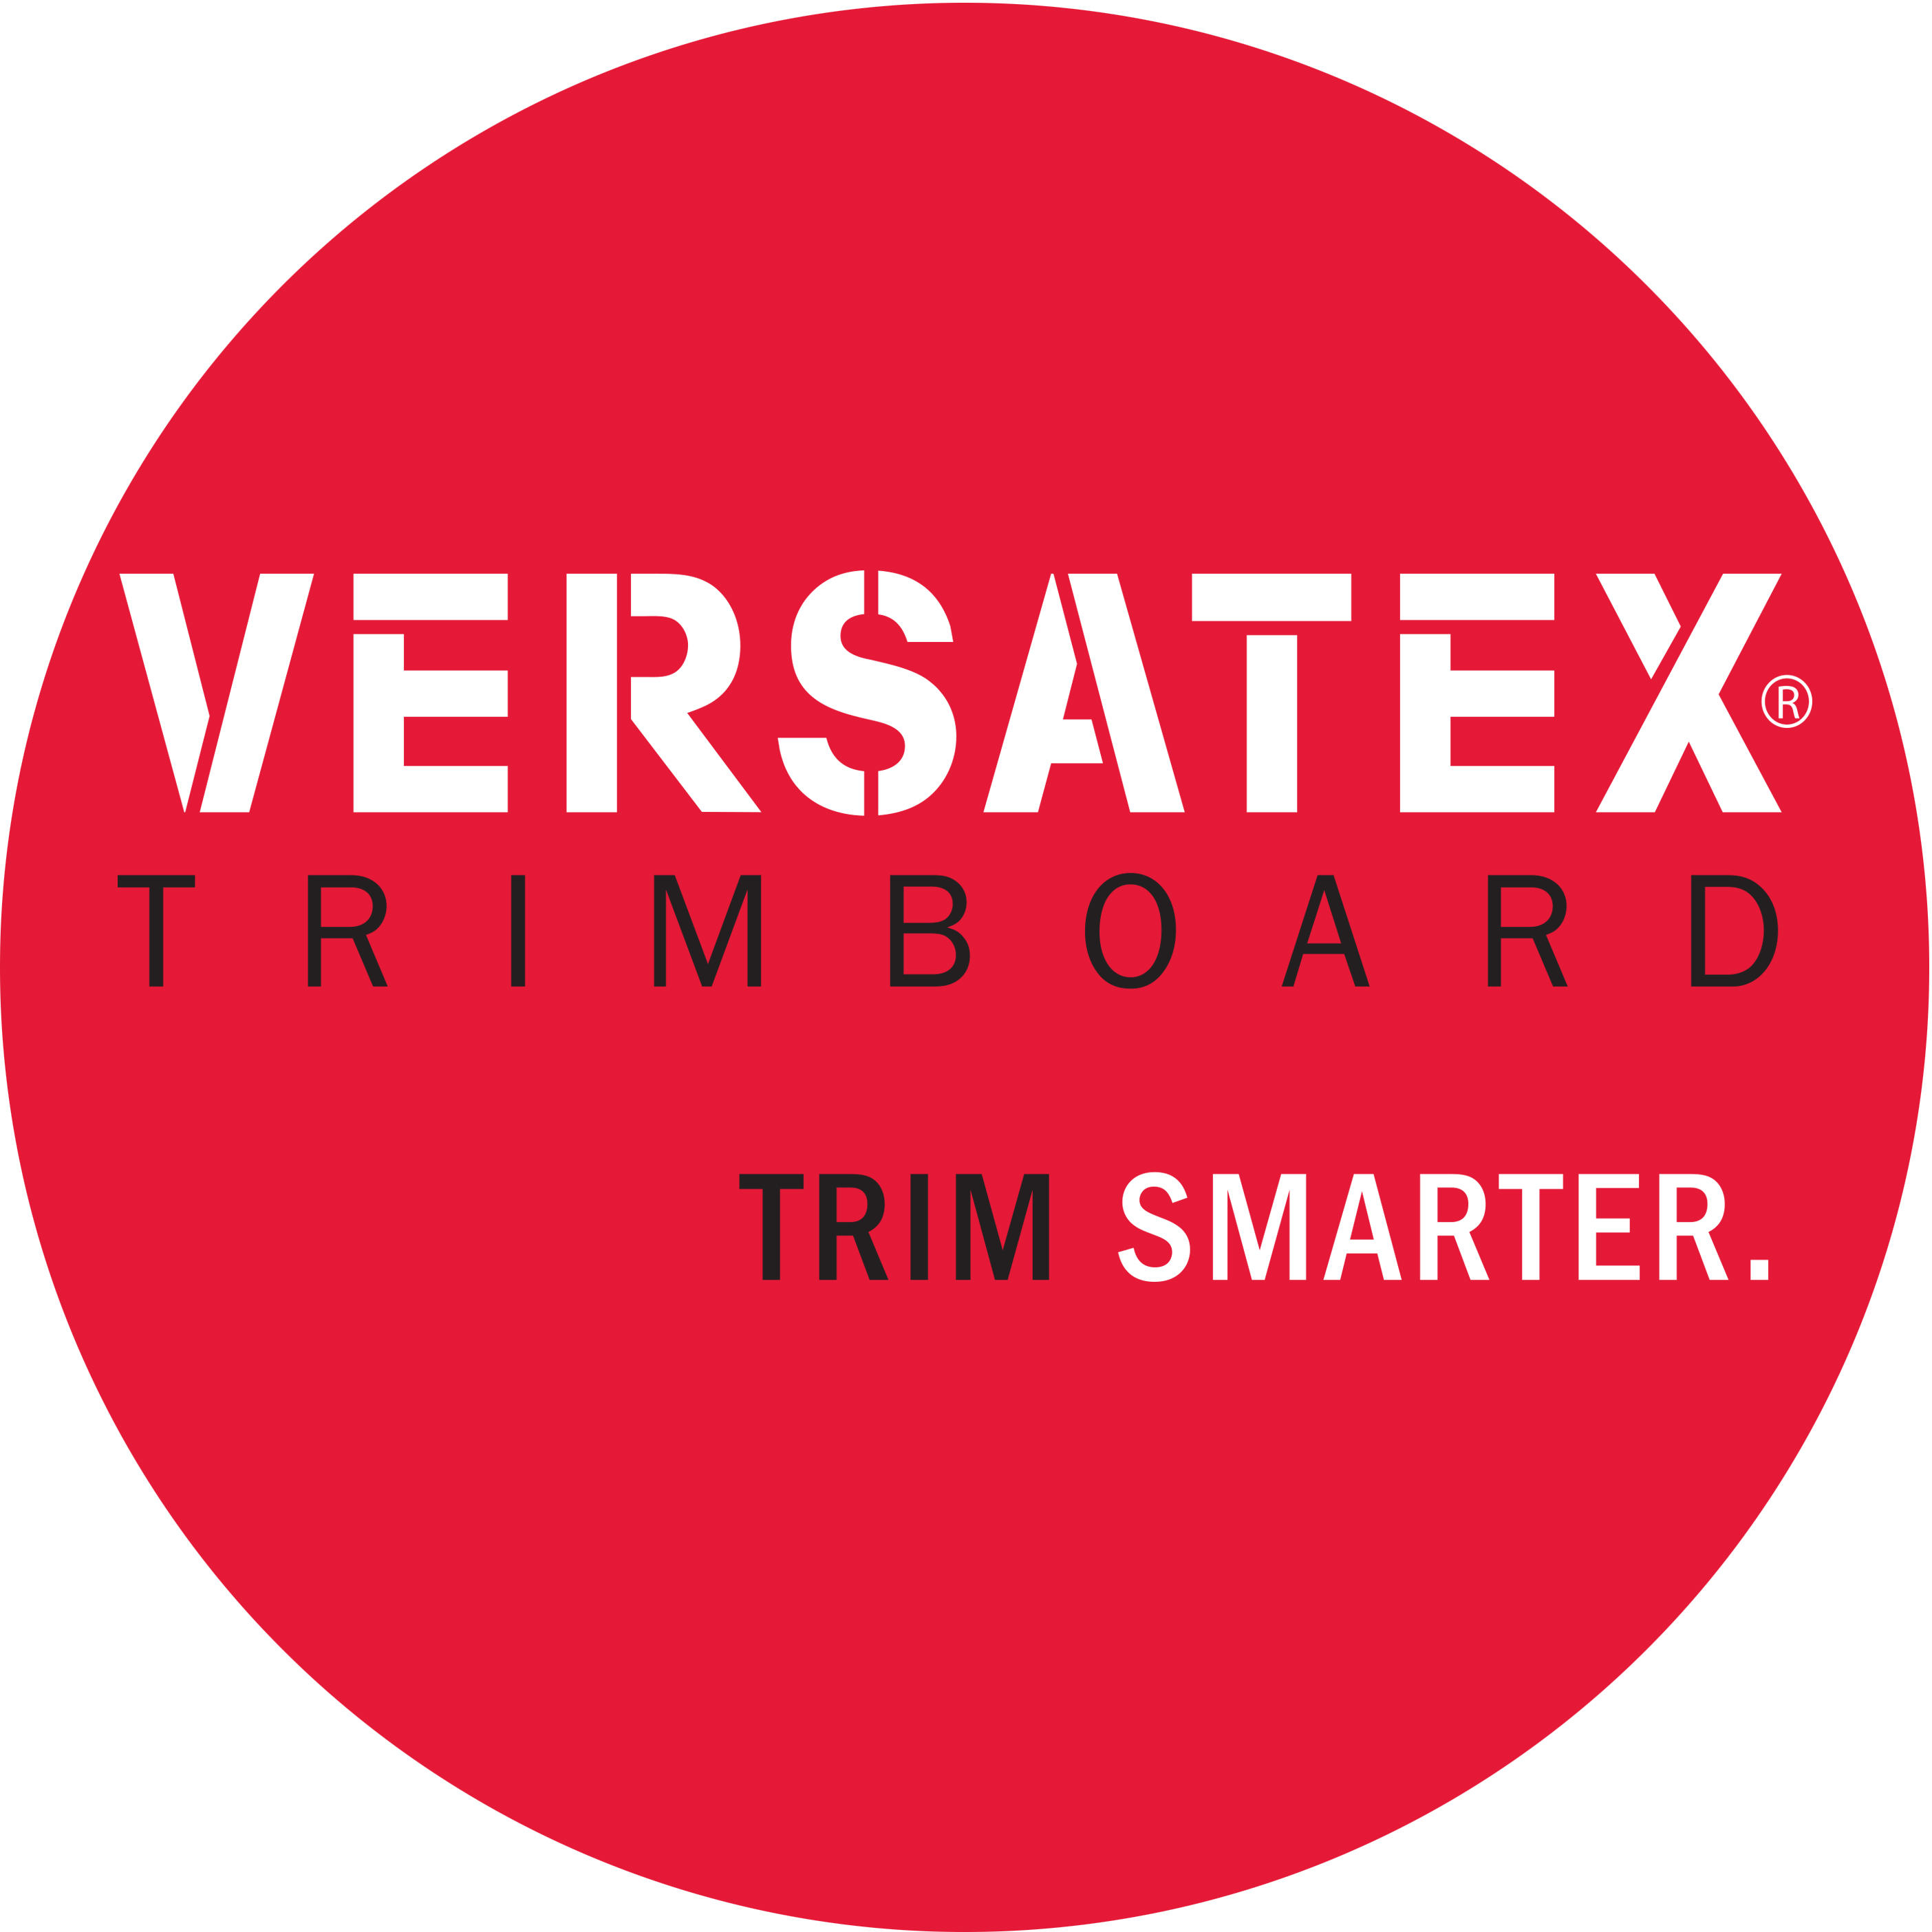 Versatex Trimboard Aliquippa Pennsylvania Pa